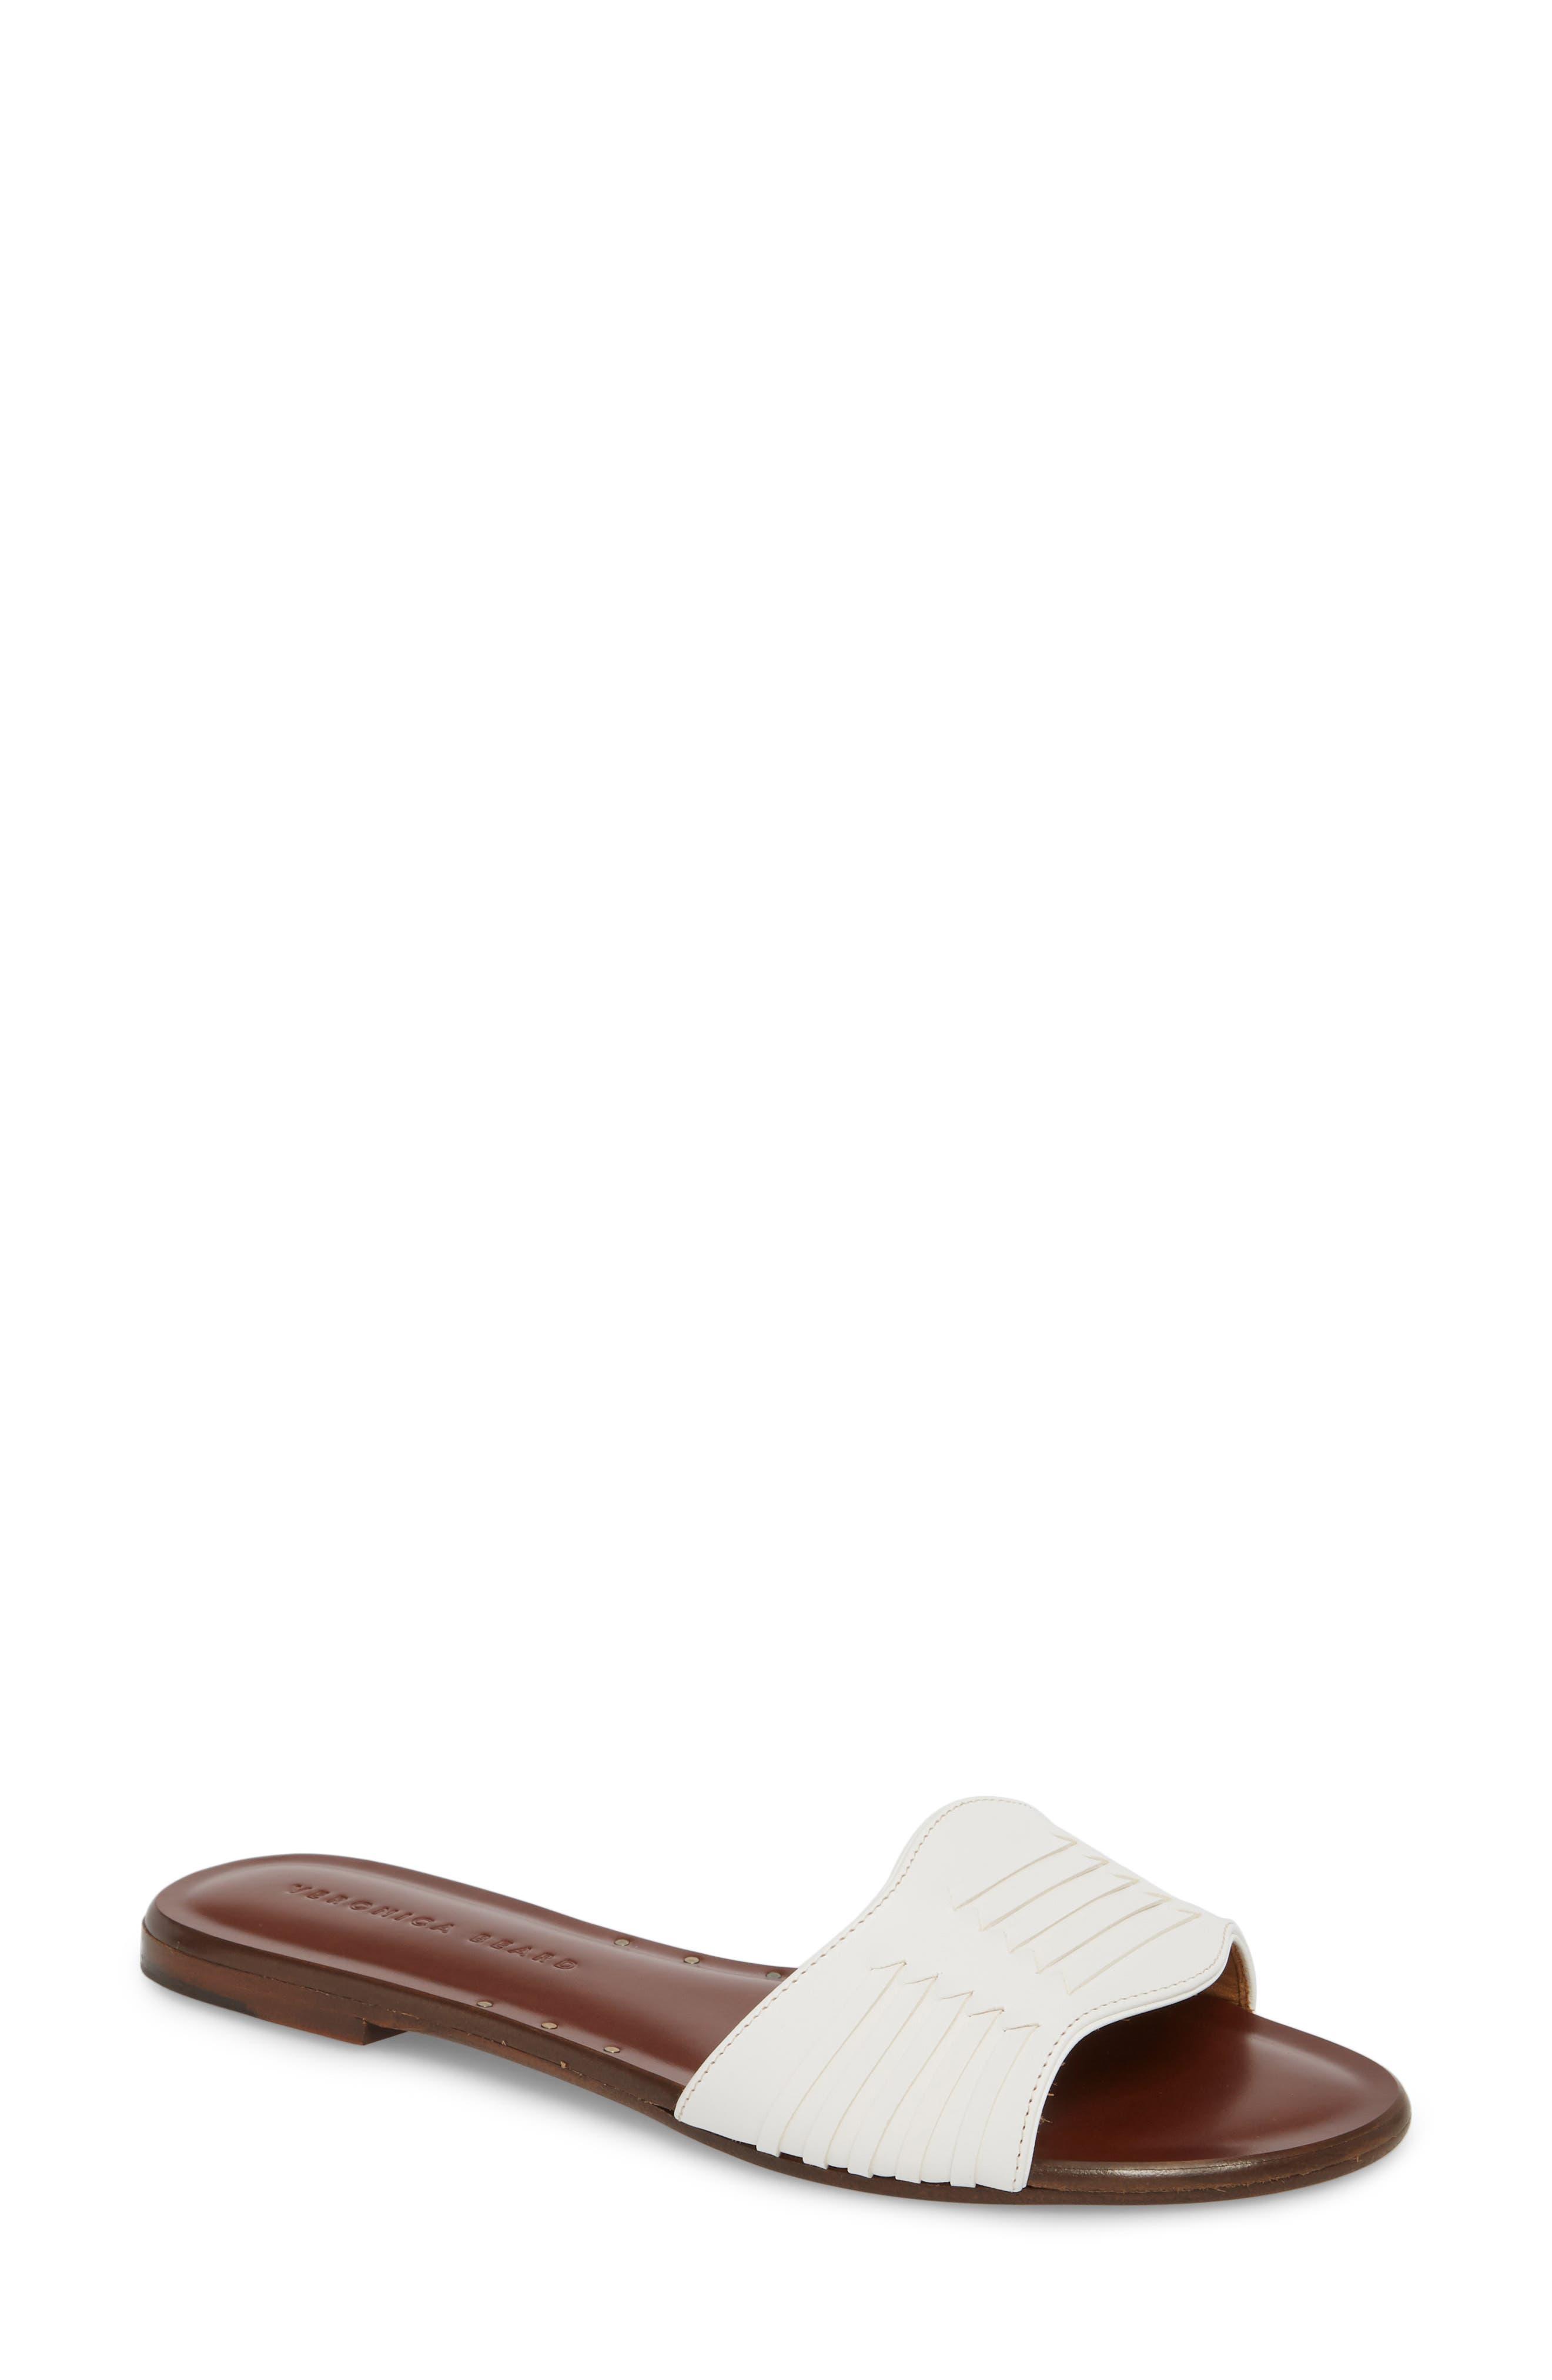 Faven Woven Slide Sandal,                         Main,                         color, White